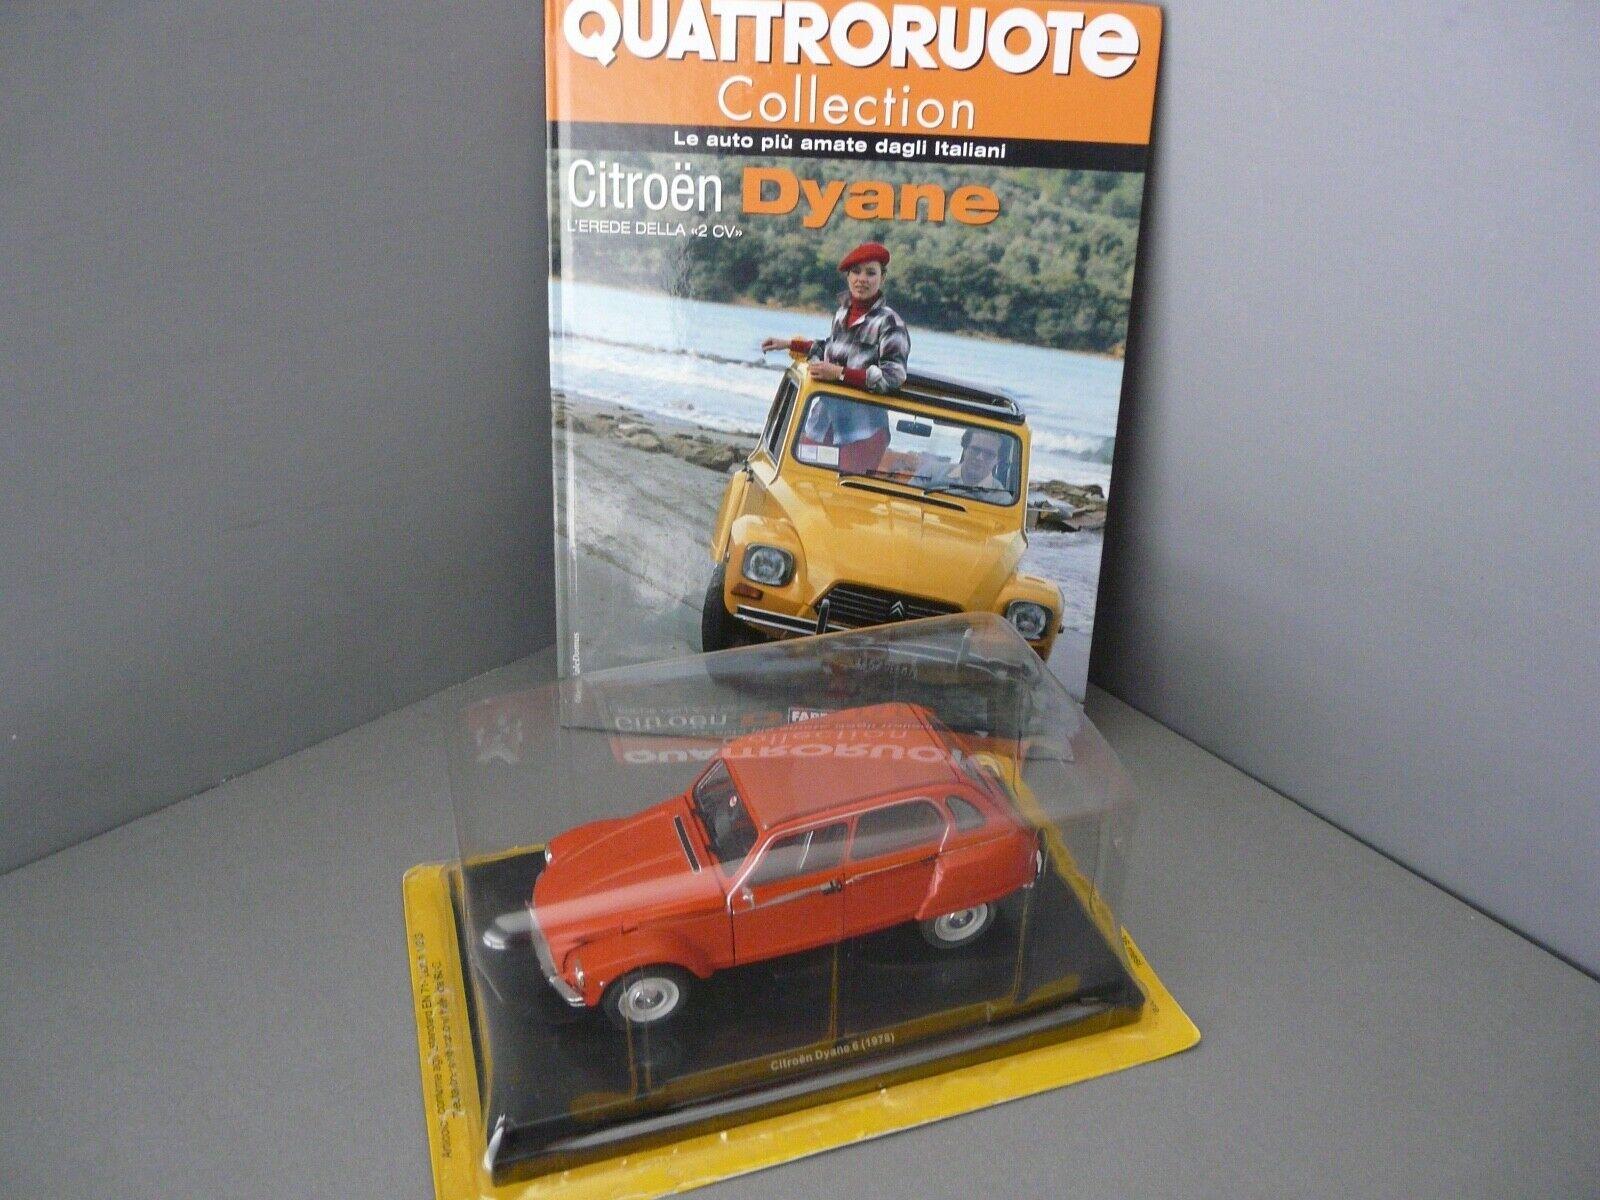 1 24 - Quattroruote METRO - 1978 CITROEN DYANE 6-Orange AVEC LIVRE (en italien)